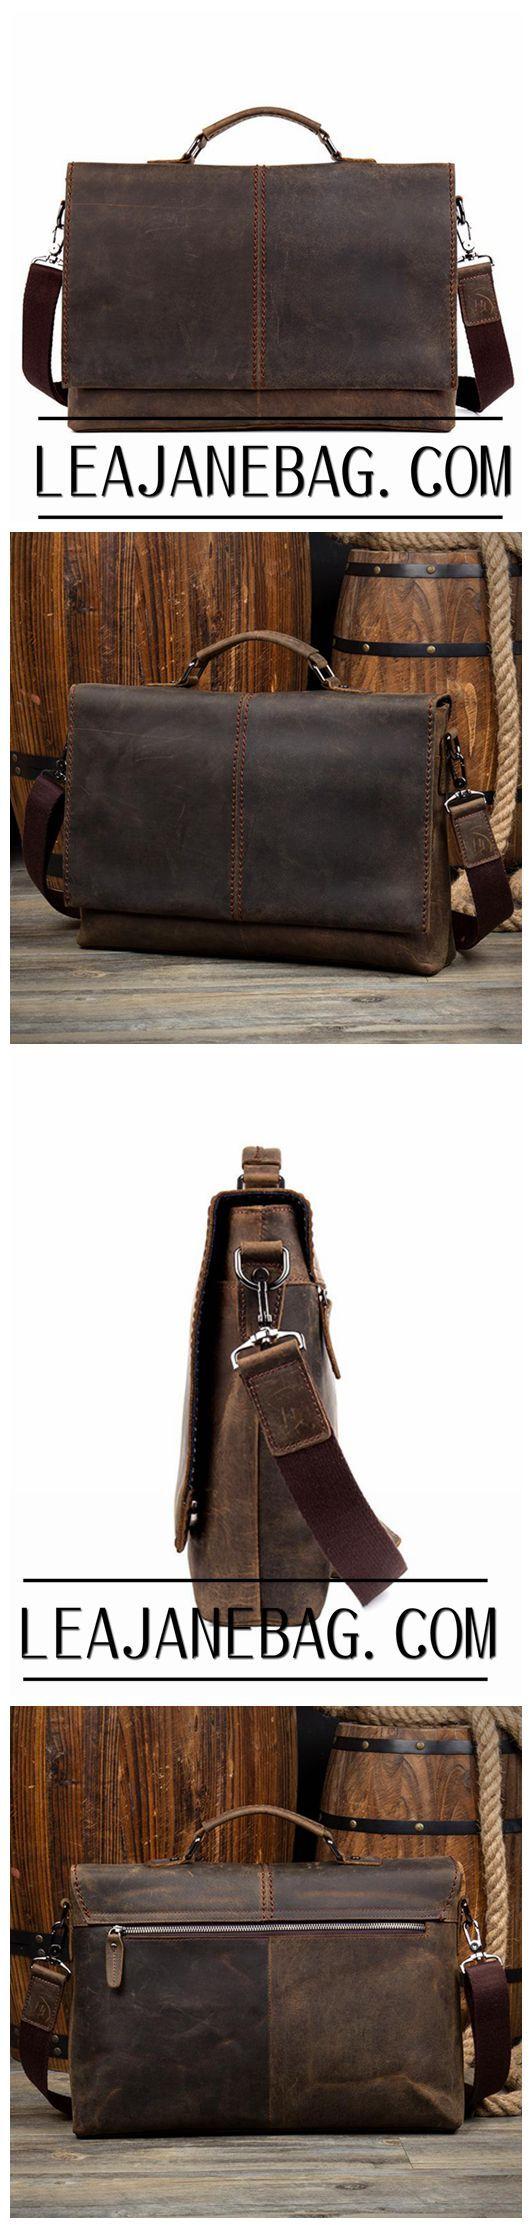 Leather Messenger Bag, Leather Briefcase, Laptop Business Bag, Genuine Brown Leather Bag MS039